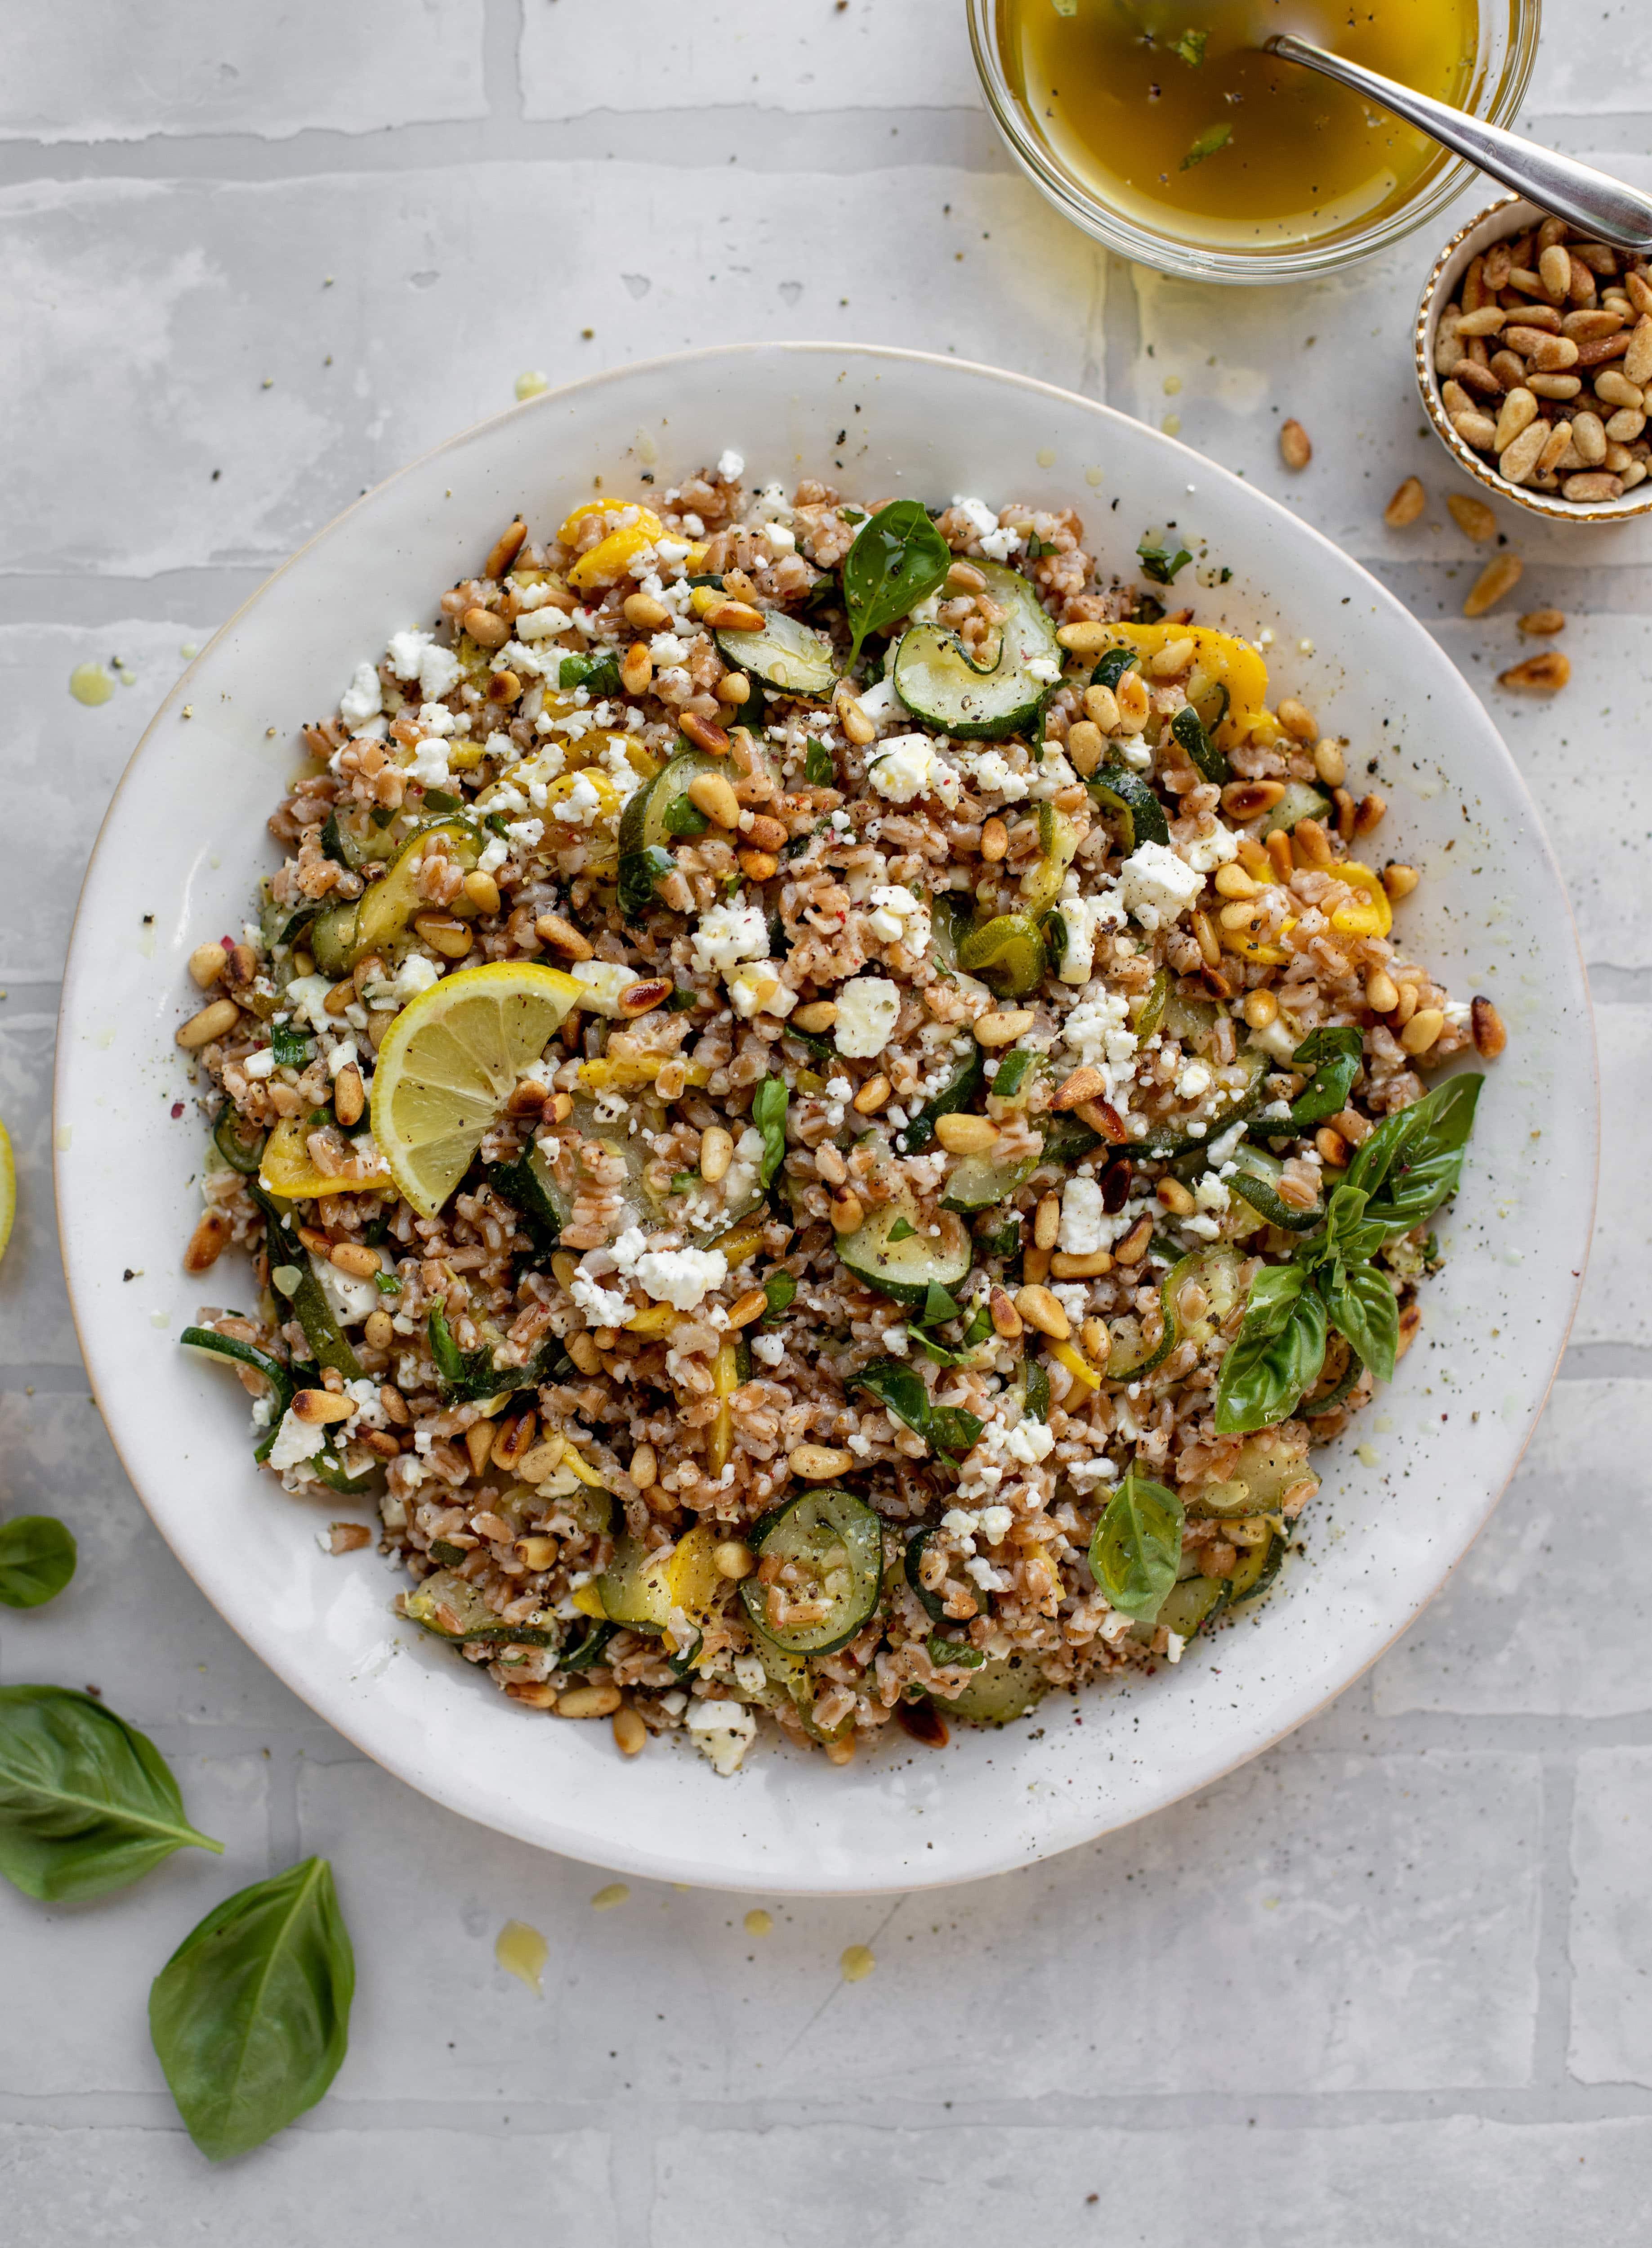 summer squash basil farro salad with lemon vinaigrette